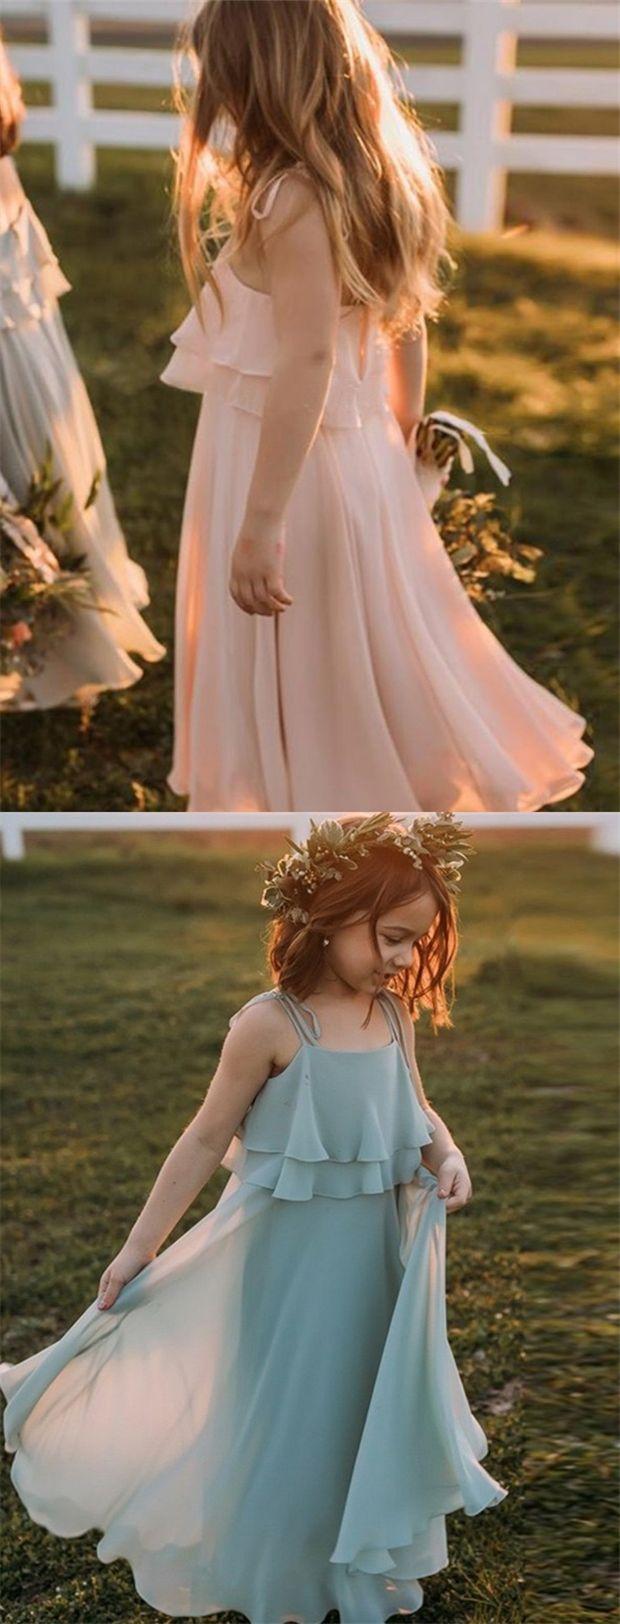 Country girl wedding dress  ALine Spaghetti Straps Sage Chiffon Flower Girl Drss with Ruffles